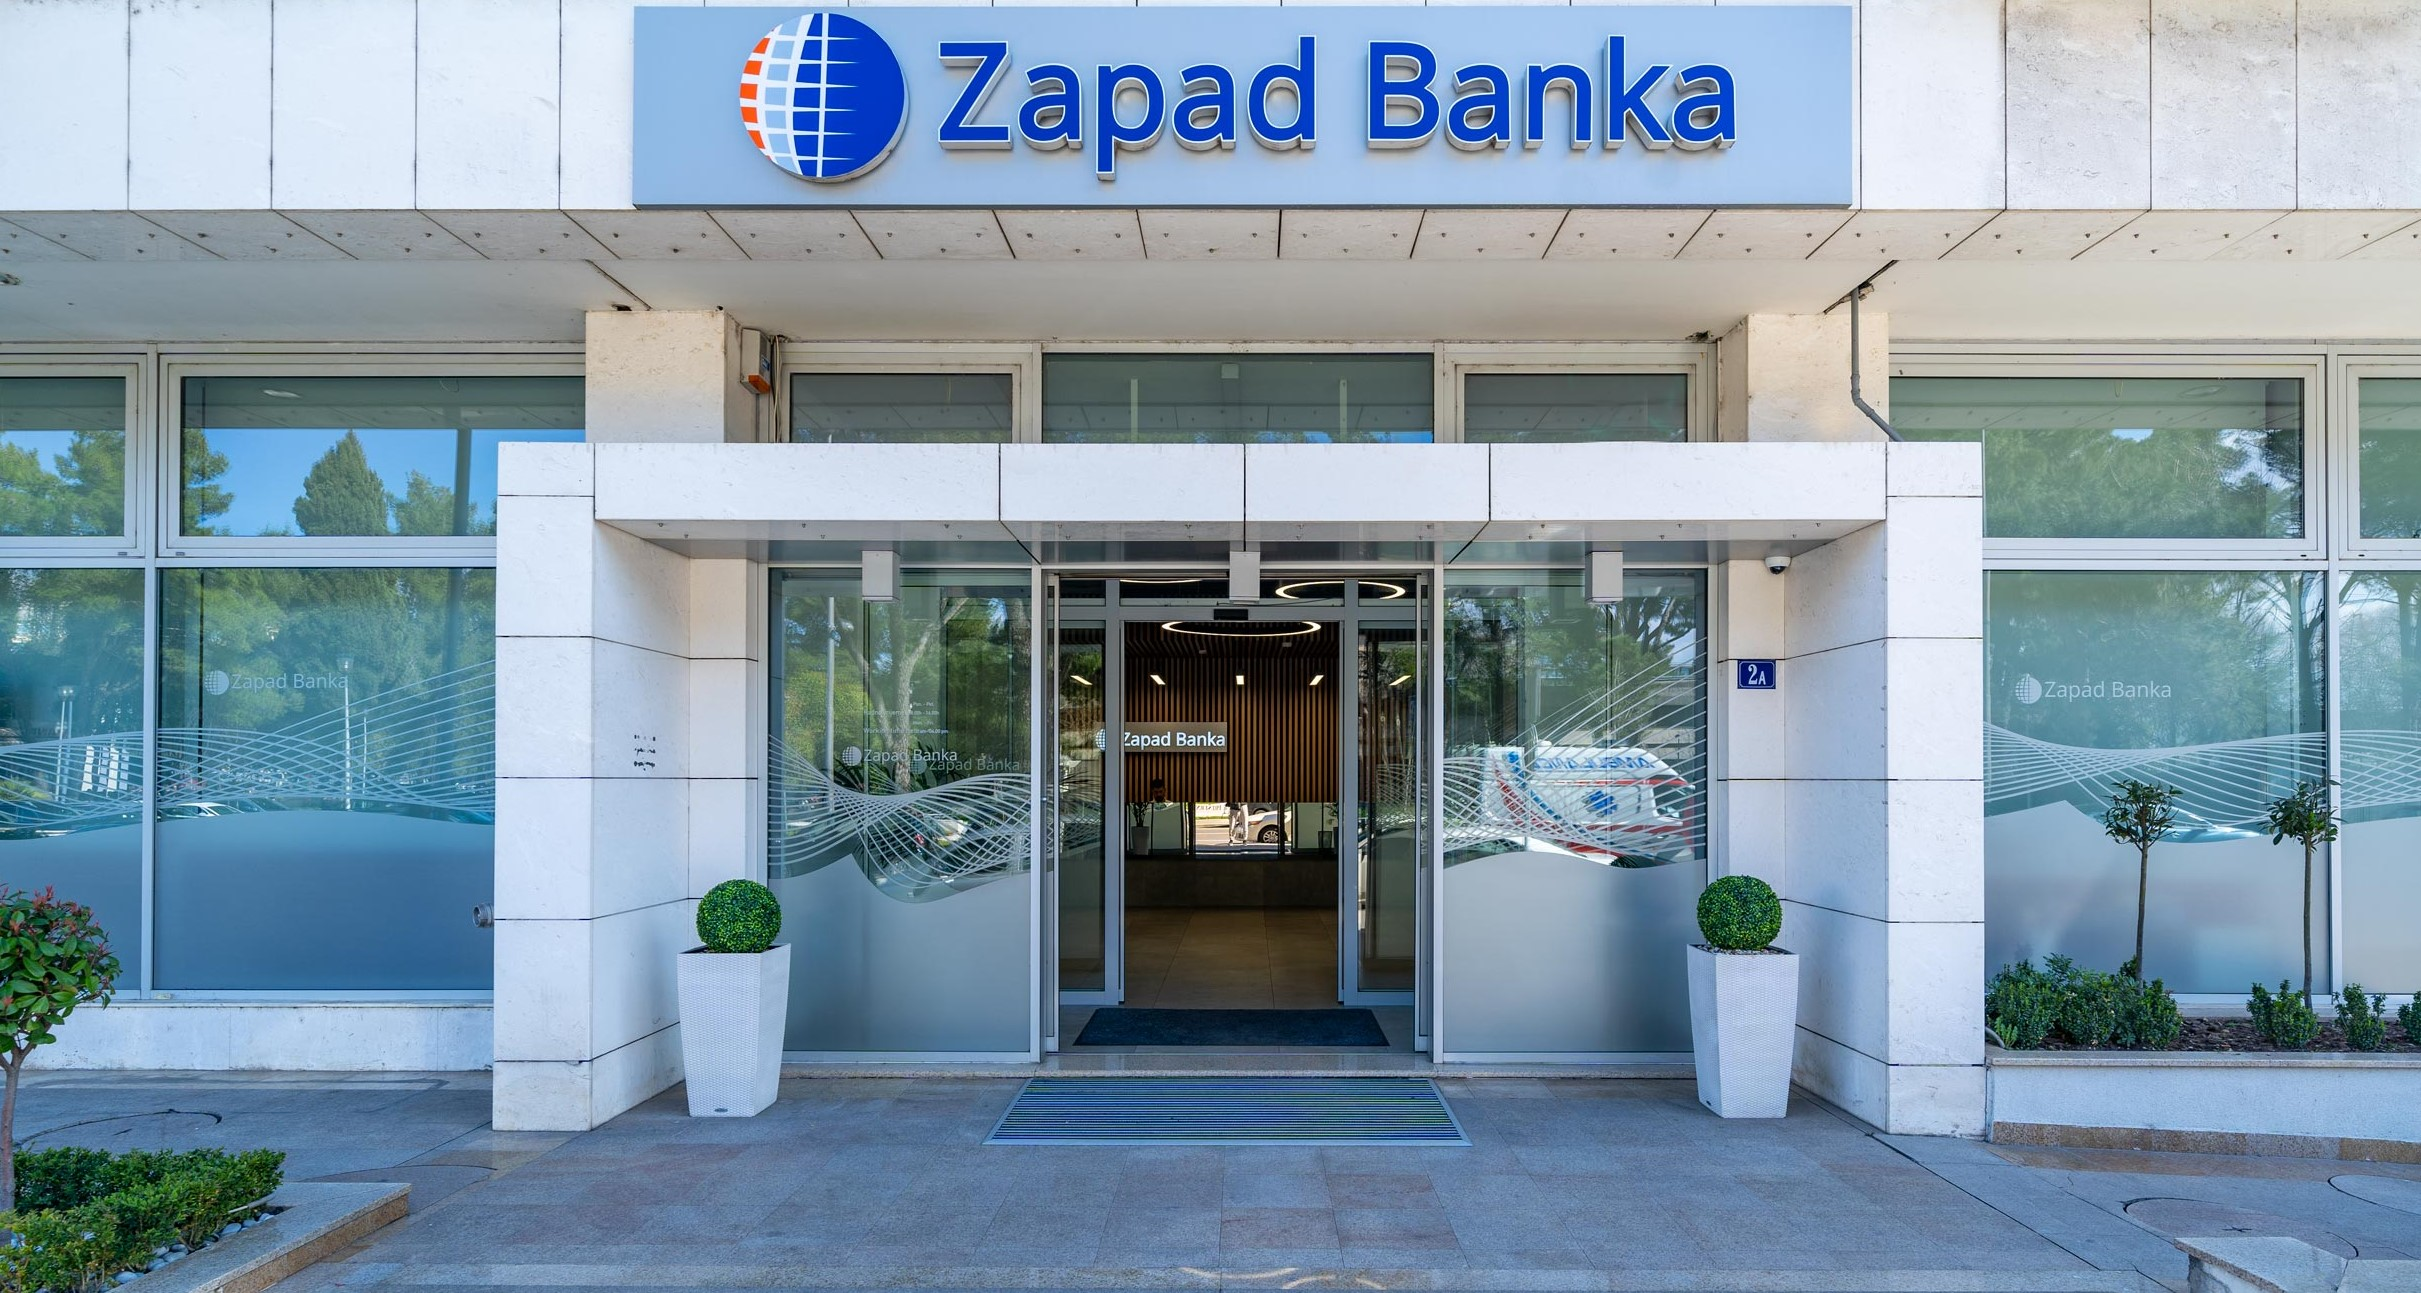 Zapad banka i njeni akcionari donirali 100 hiljada EUR NKT-u